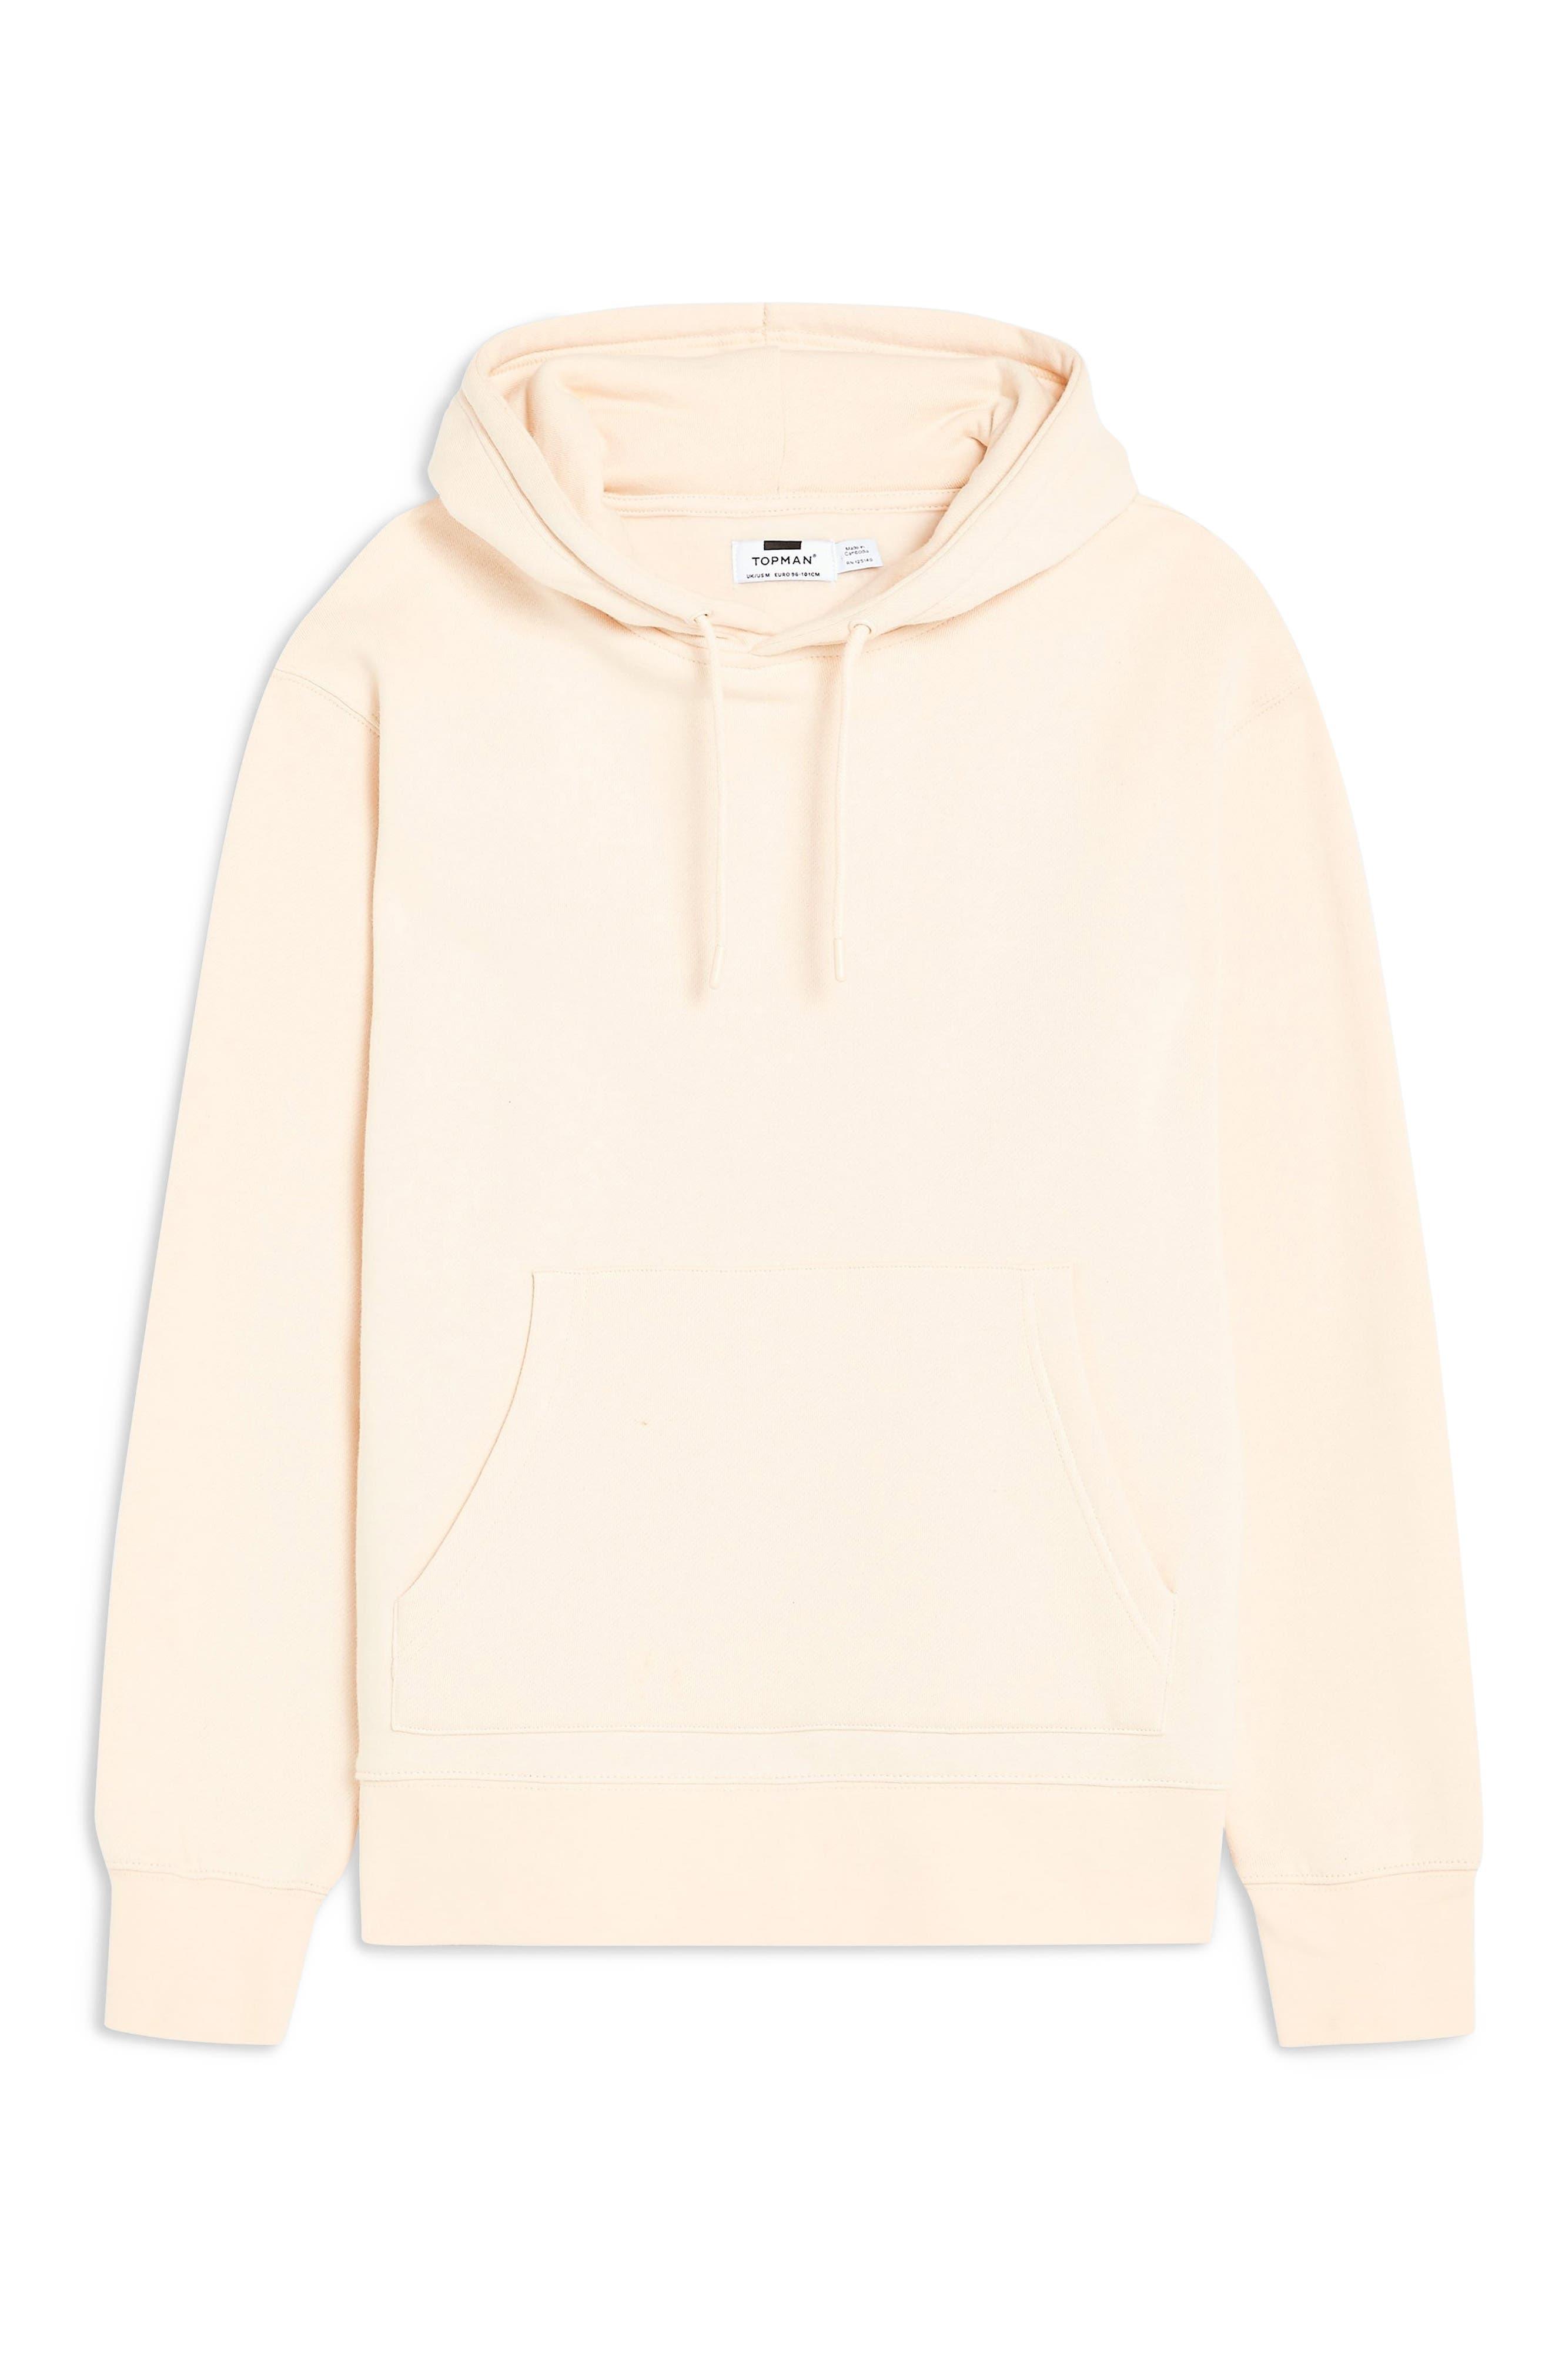 TOPMAN, Tristan Hooded Sweatshirt, Alternate thumbnail 3, color, STONE